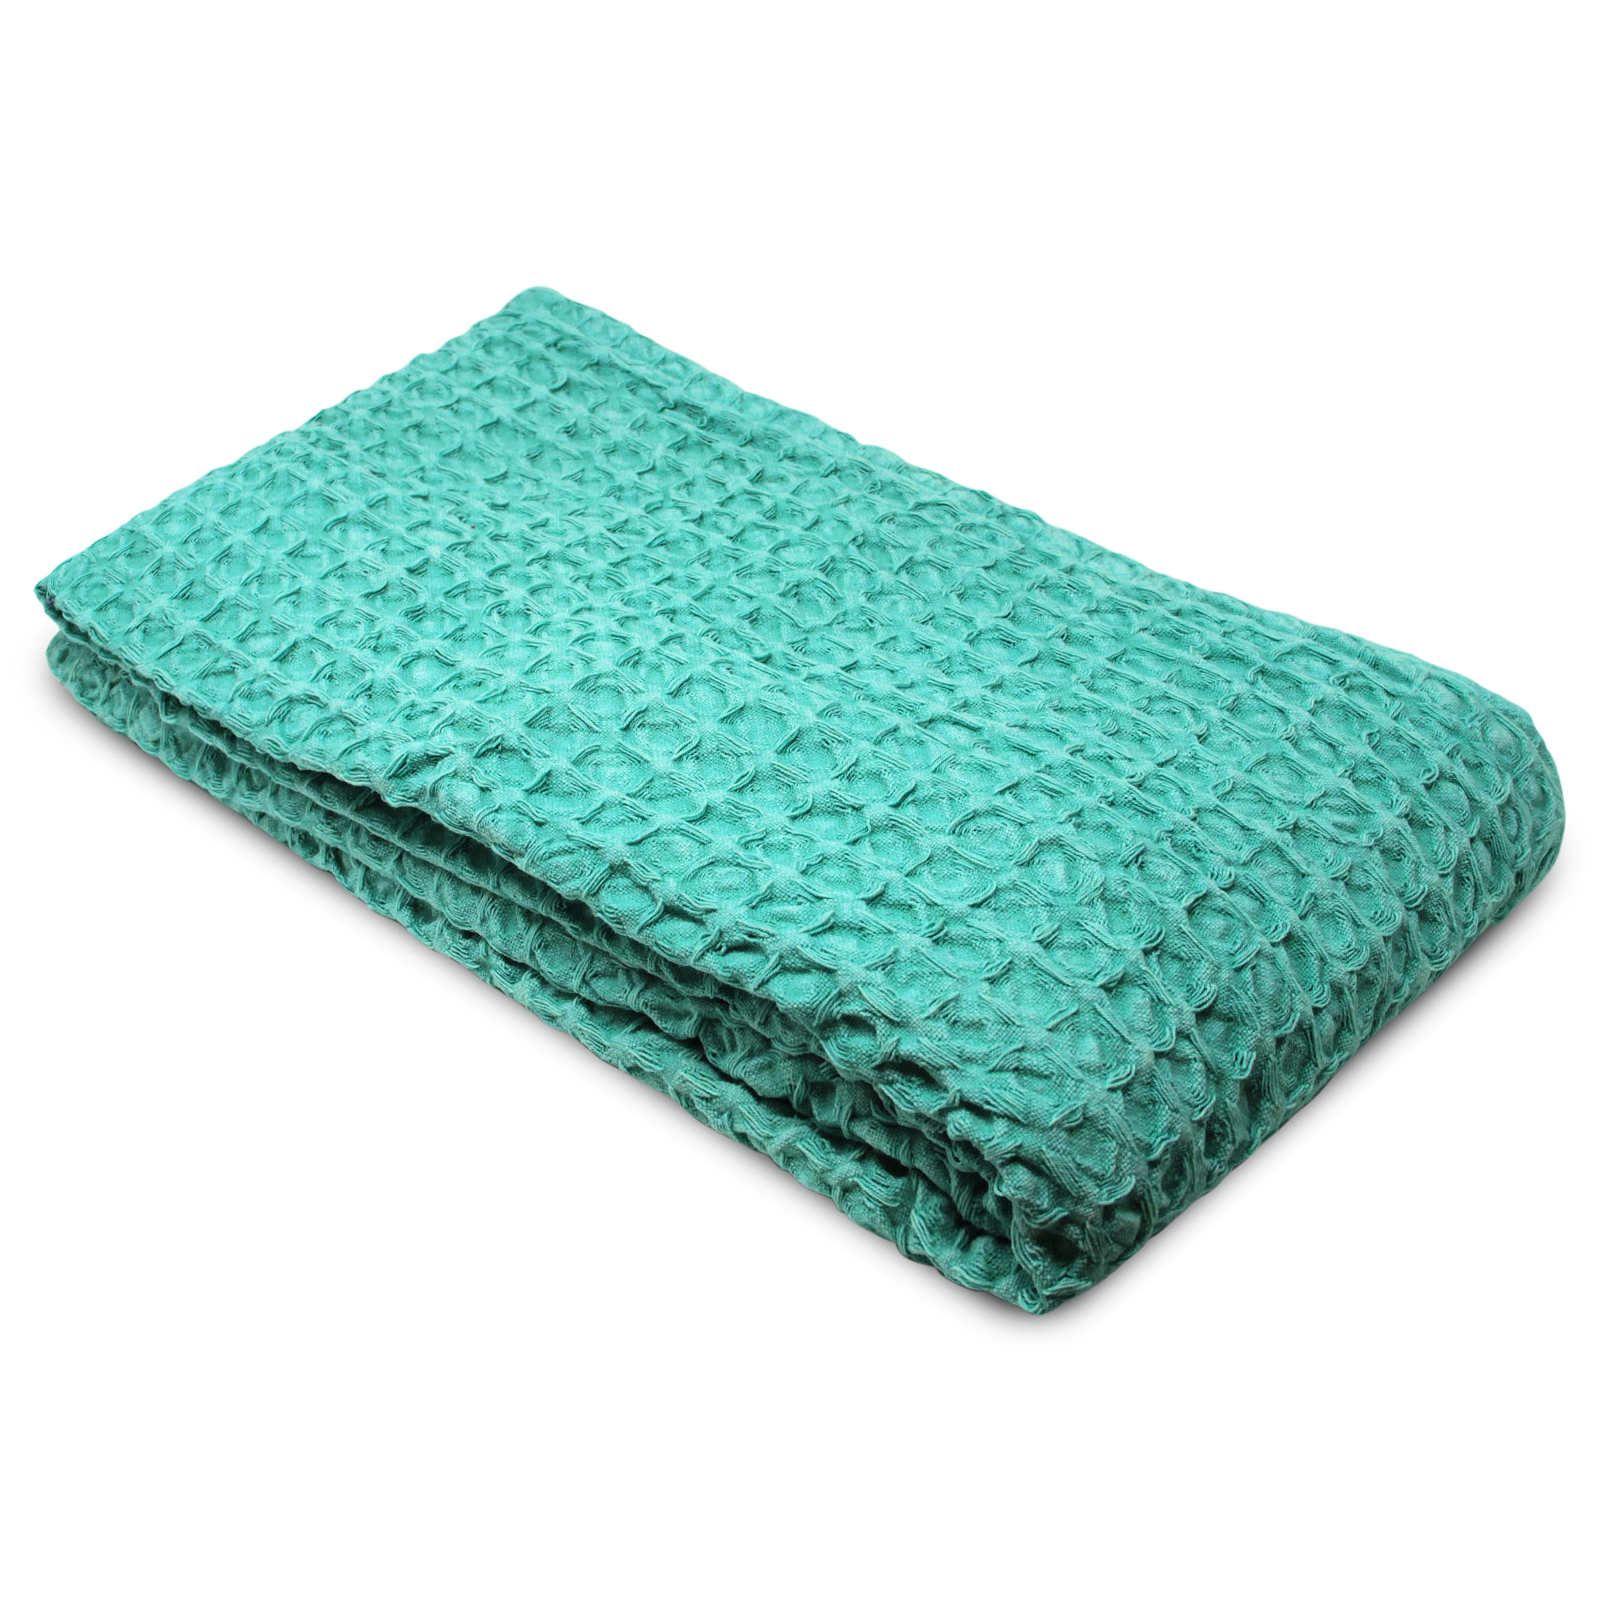 Oregon-Stonewash-Waffle-Throw-Modern-Distressed-Sofa-Bed-Blankets-100-Cotton thumbnail 3